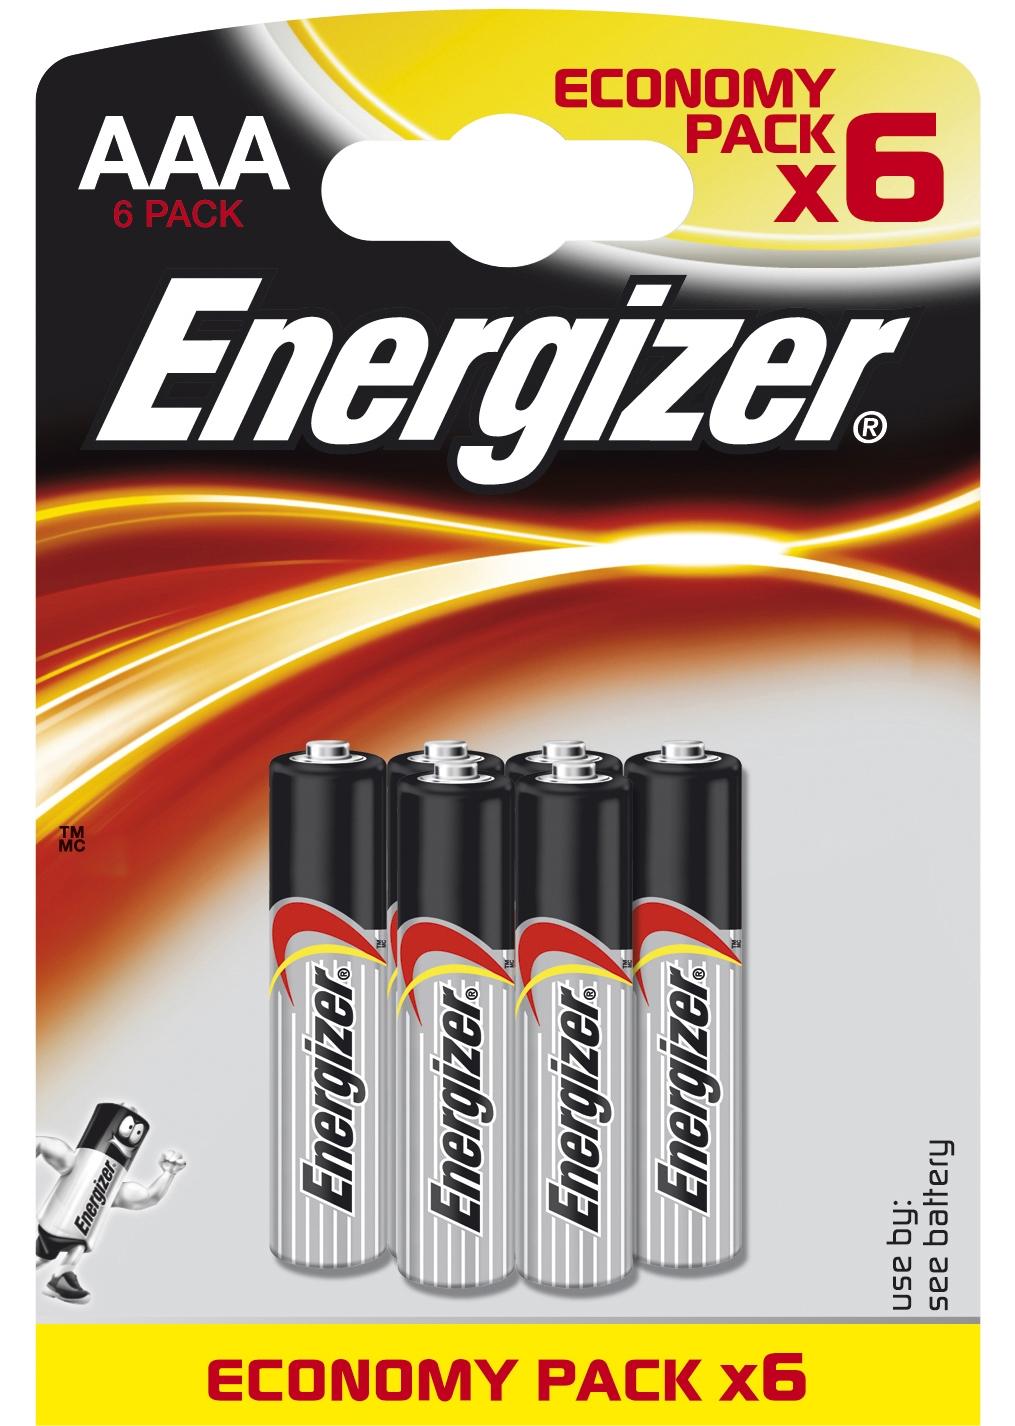 Элементы питания Energizer Батарейка Energizer Alkaline Power AAA/LR03 FSB6 6 шт. батарейка energizer base aaa multi blister 20 шт